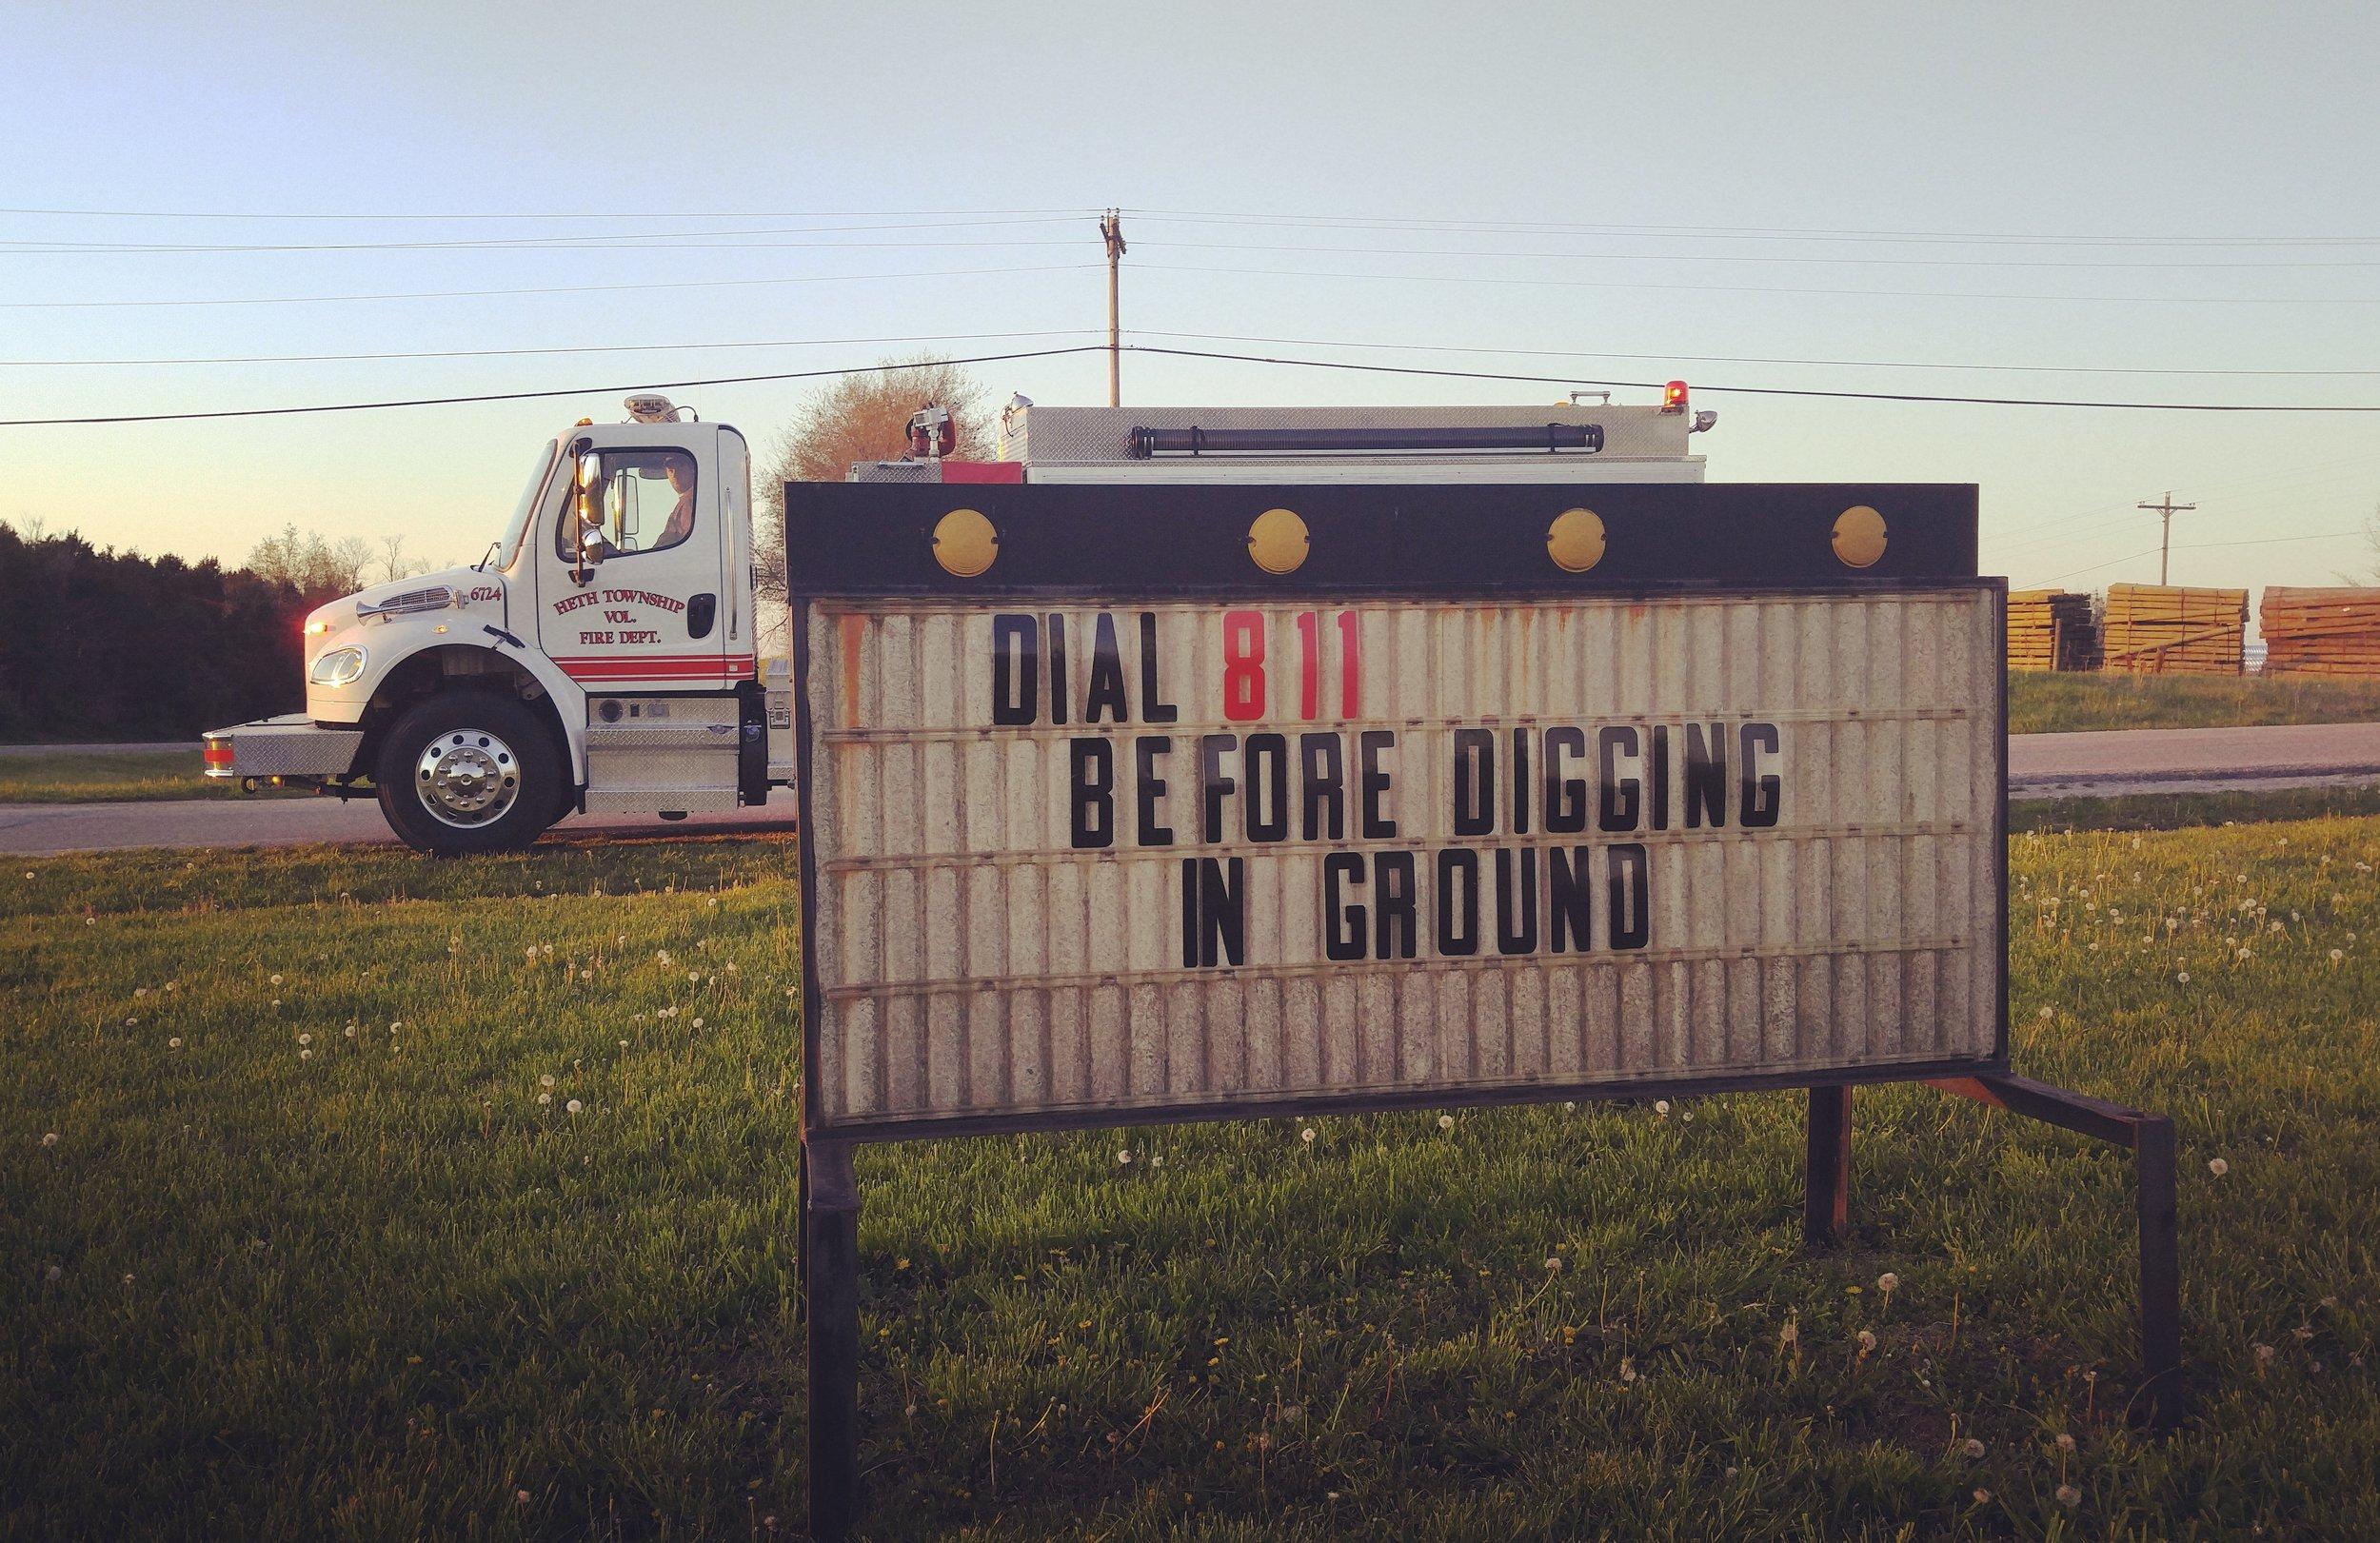 Heth Township Vol. Fire Department